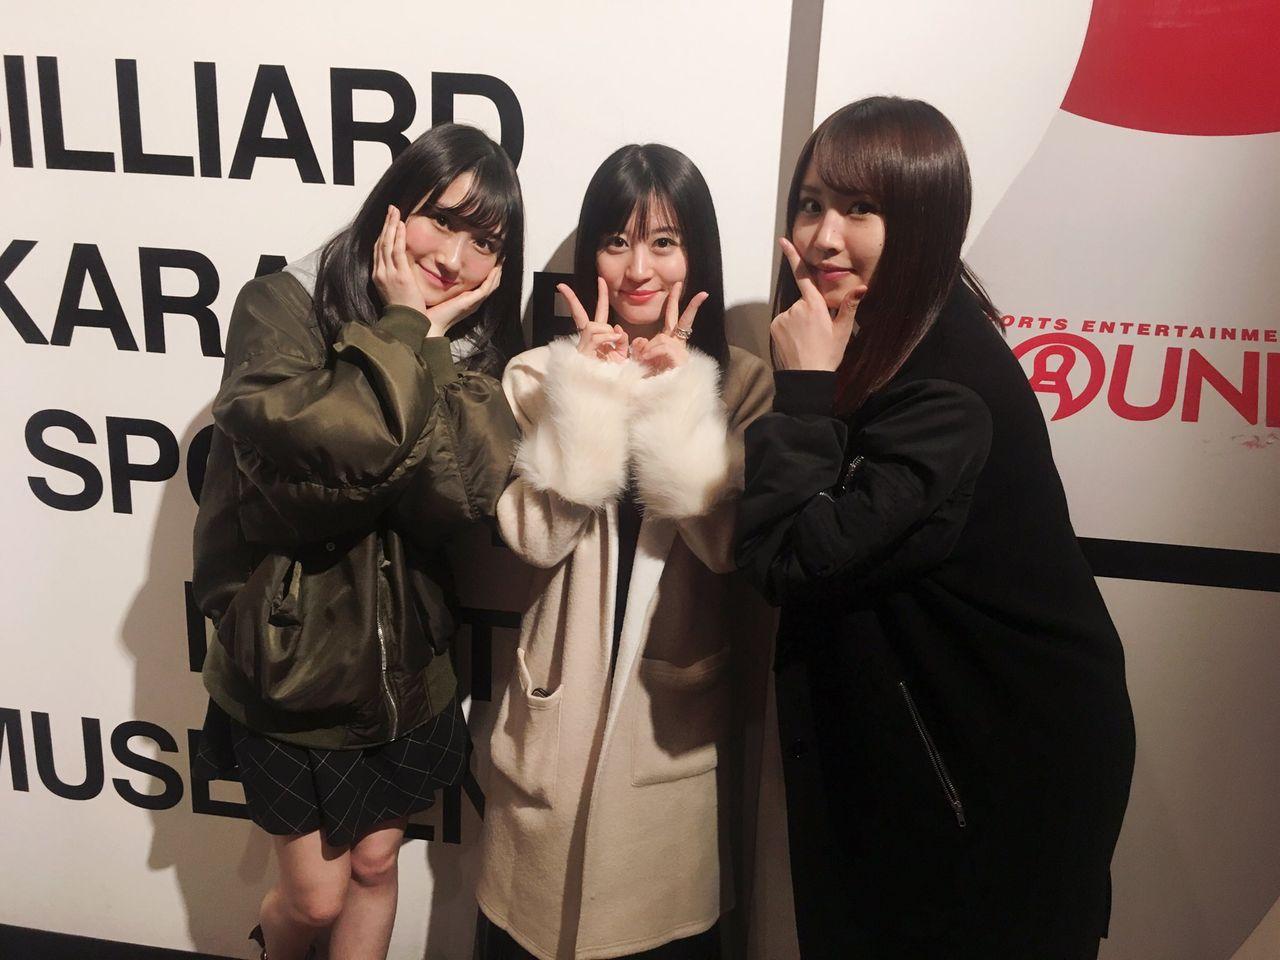 【NMB48】矢倉楓子「卒業後は一旦お休み」芸能界復帰も視野か?